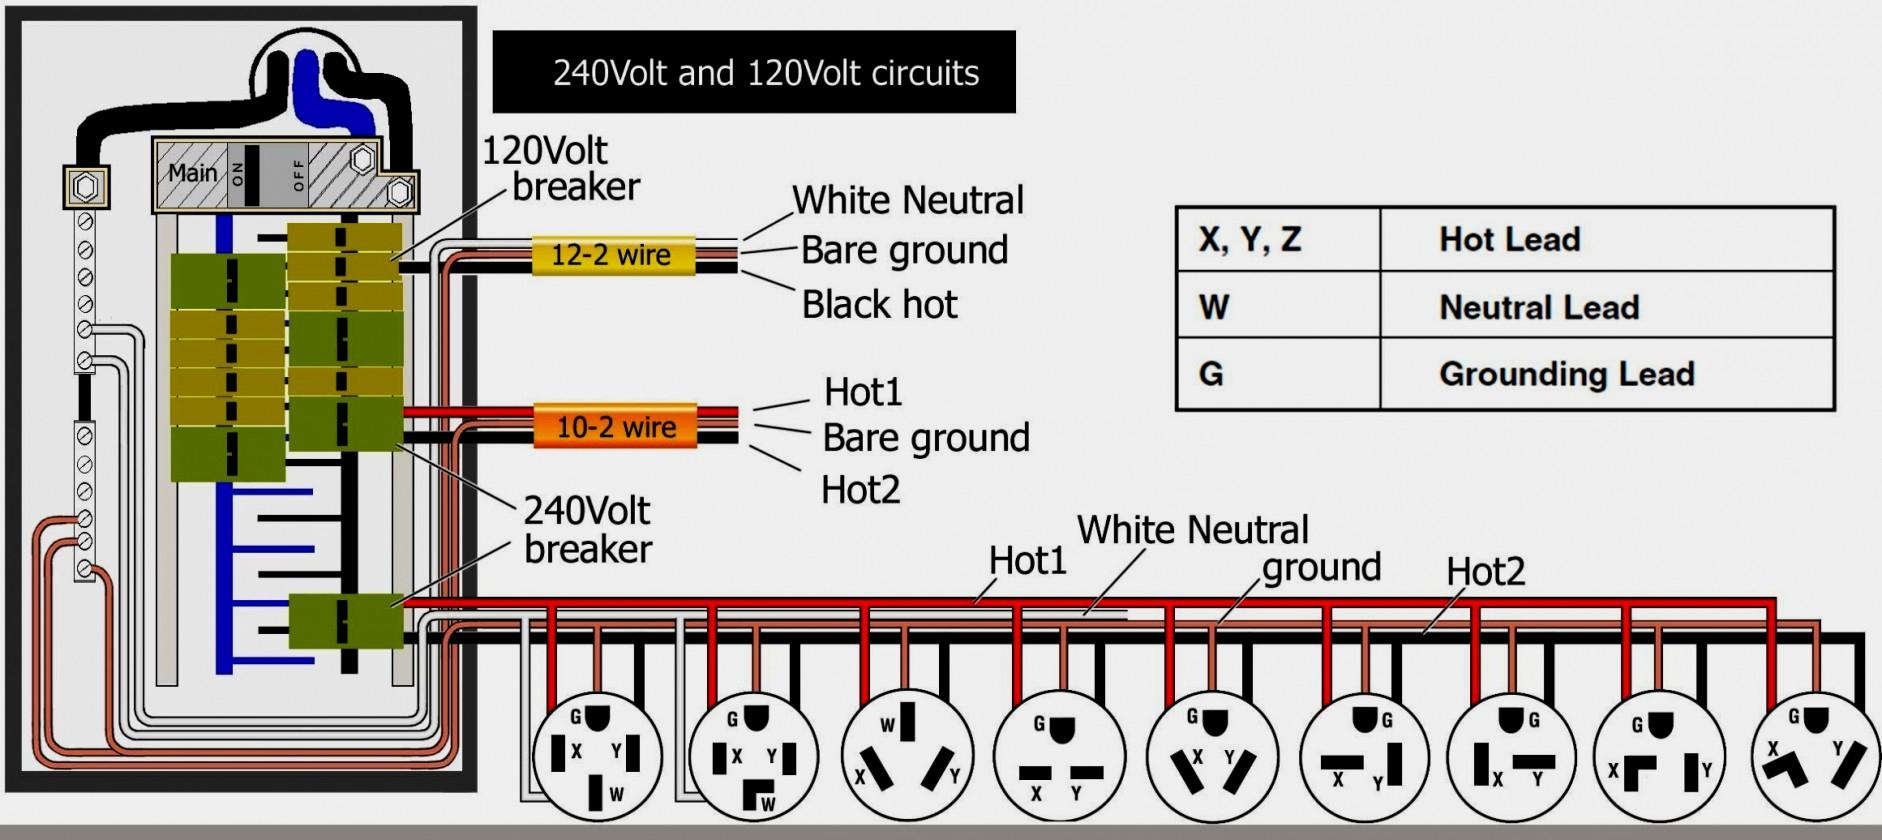 4 Prong Twist Lock Plug Wiring Diagram - Schematics Wiring Diagram - 4 Prong Twist Lock Plug Wiring Diagram